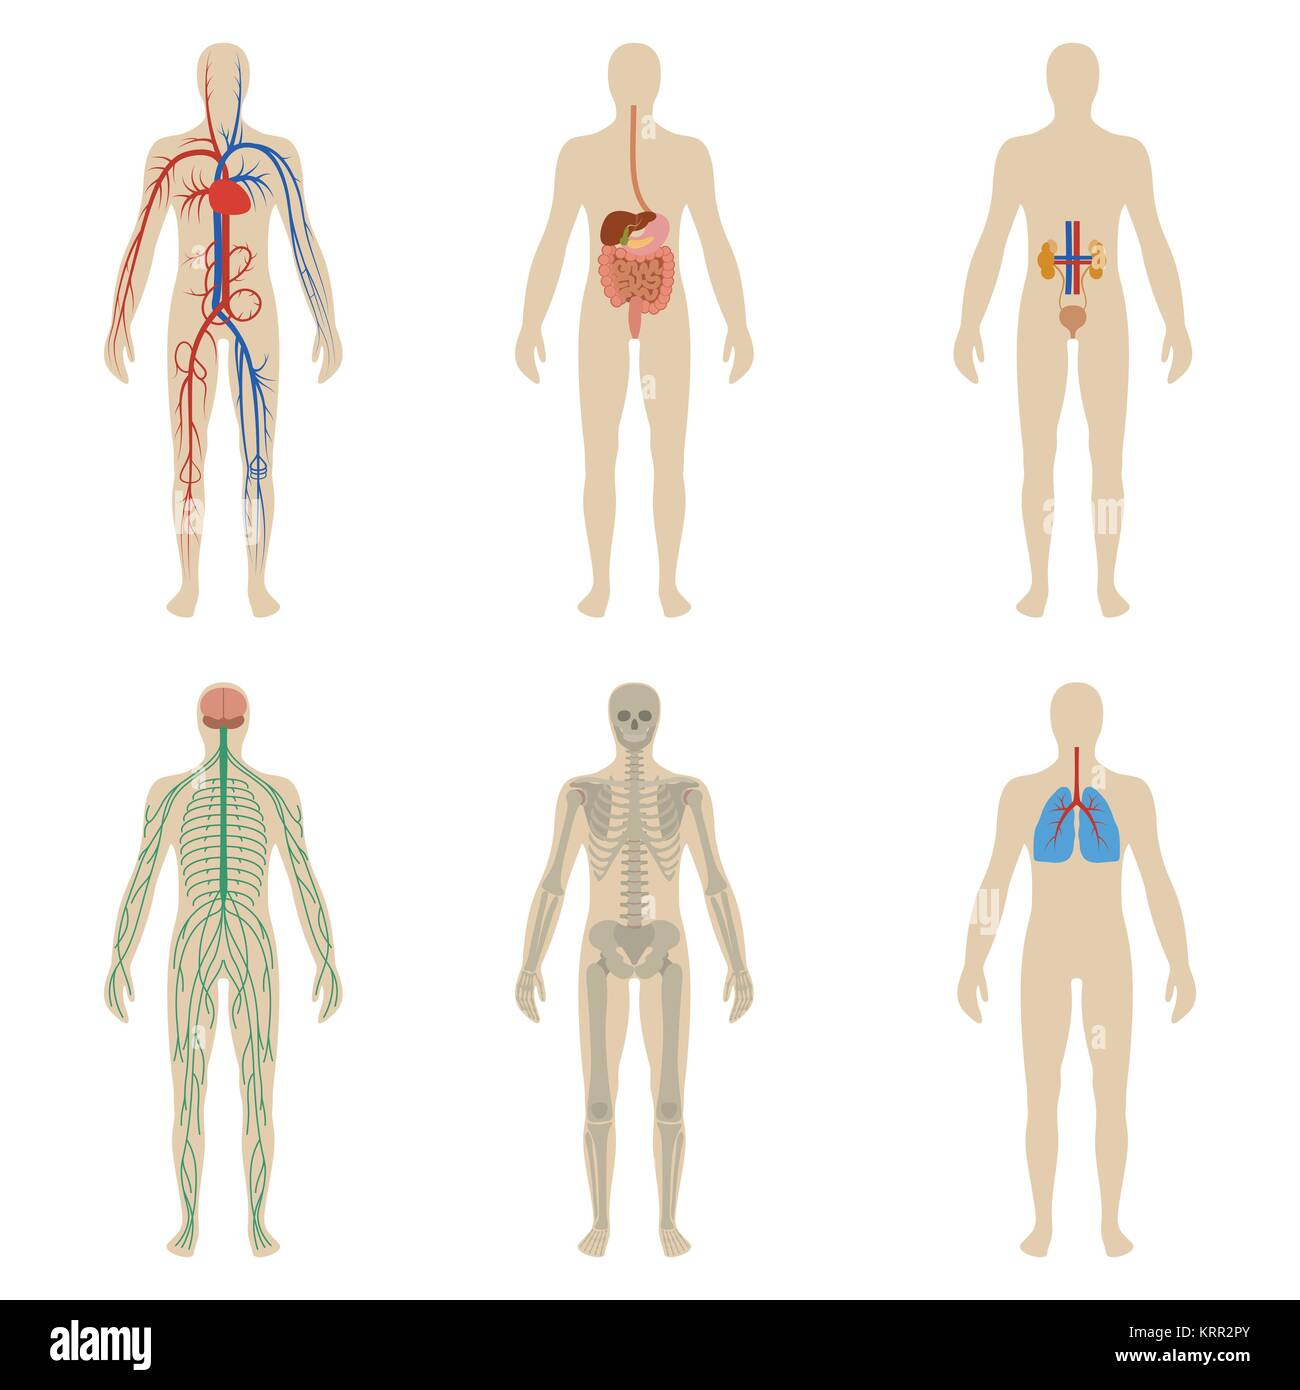 Human Digestive Systems Imágenes De Stock & Human Digestive Systems ...